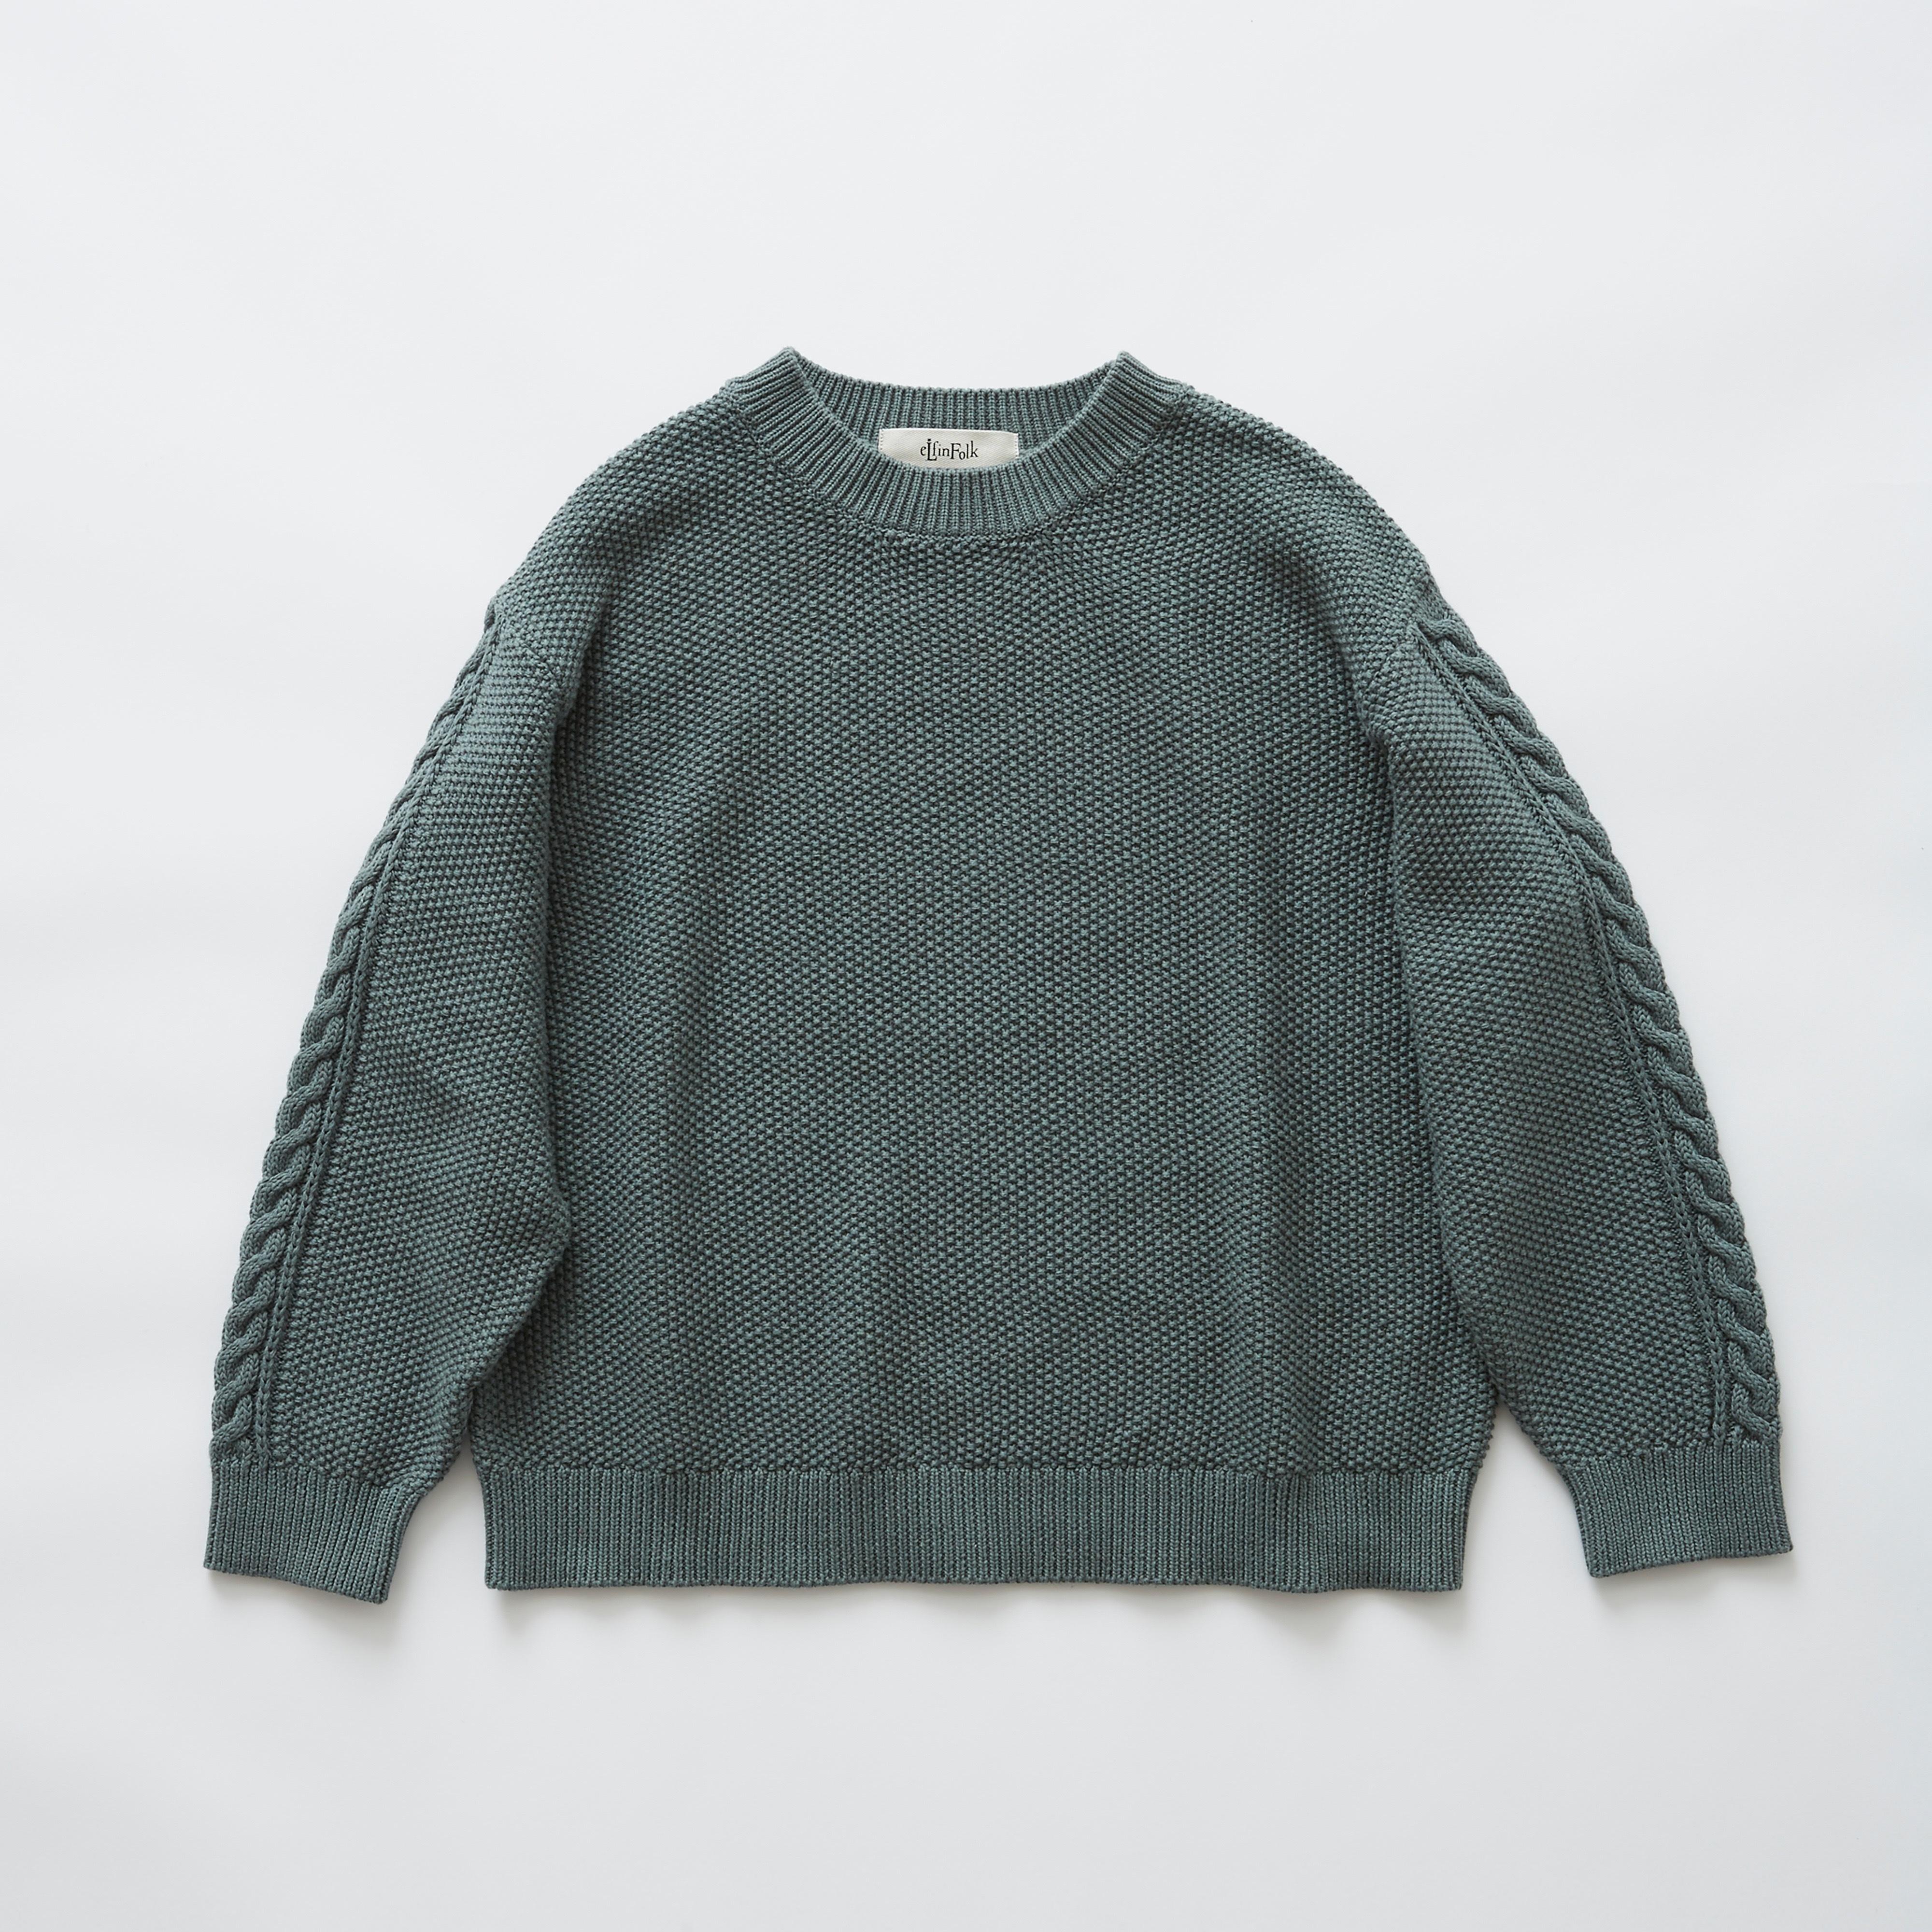 《eLfinFolk 2019SS》moss stitch sweater / sage green / F(大人)